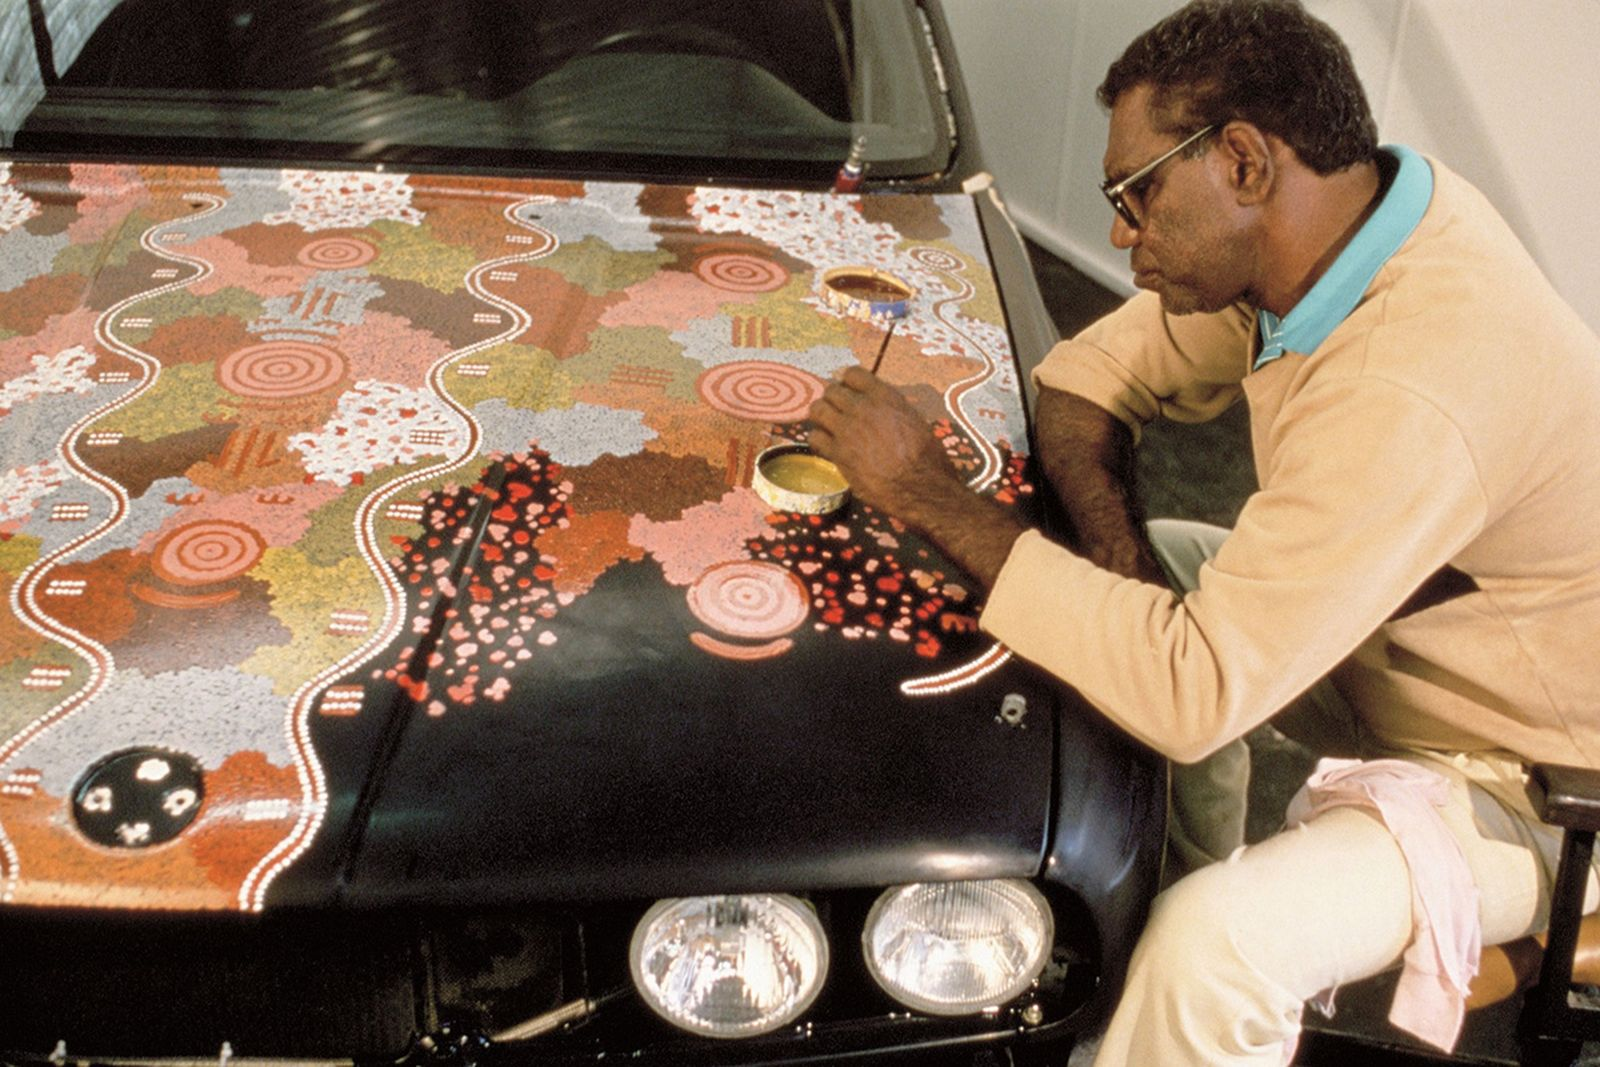 BMW Art Car 06, Michael Jagamara, 1989